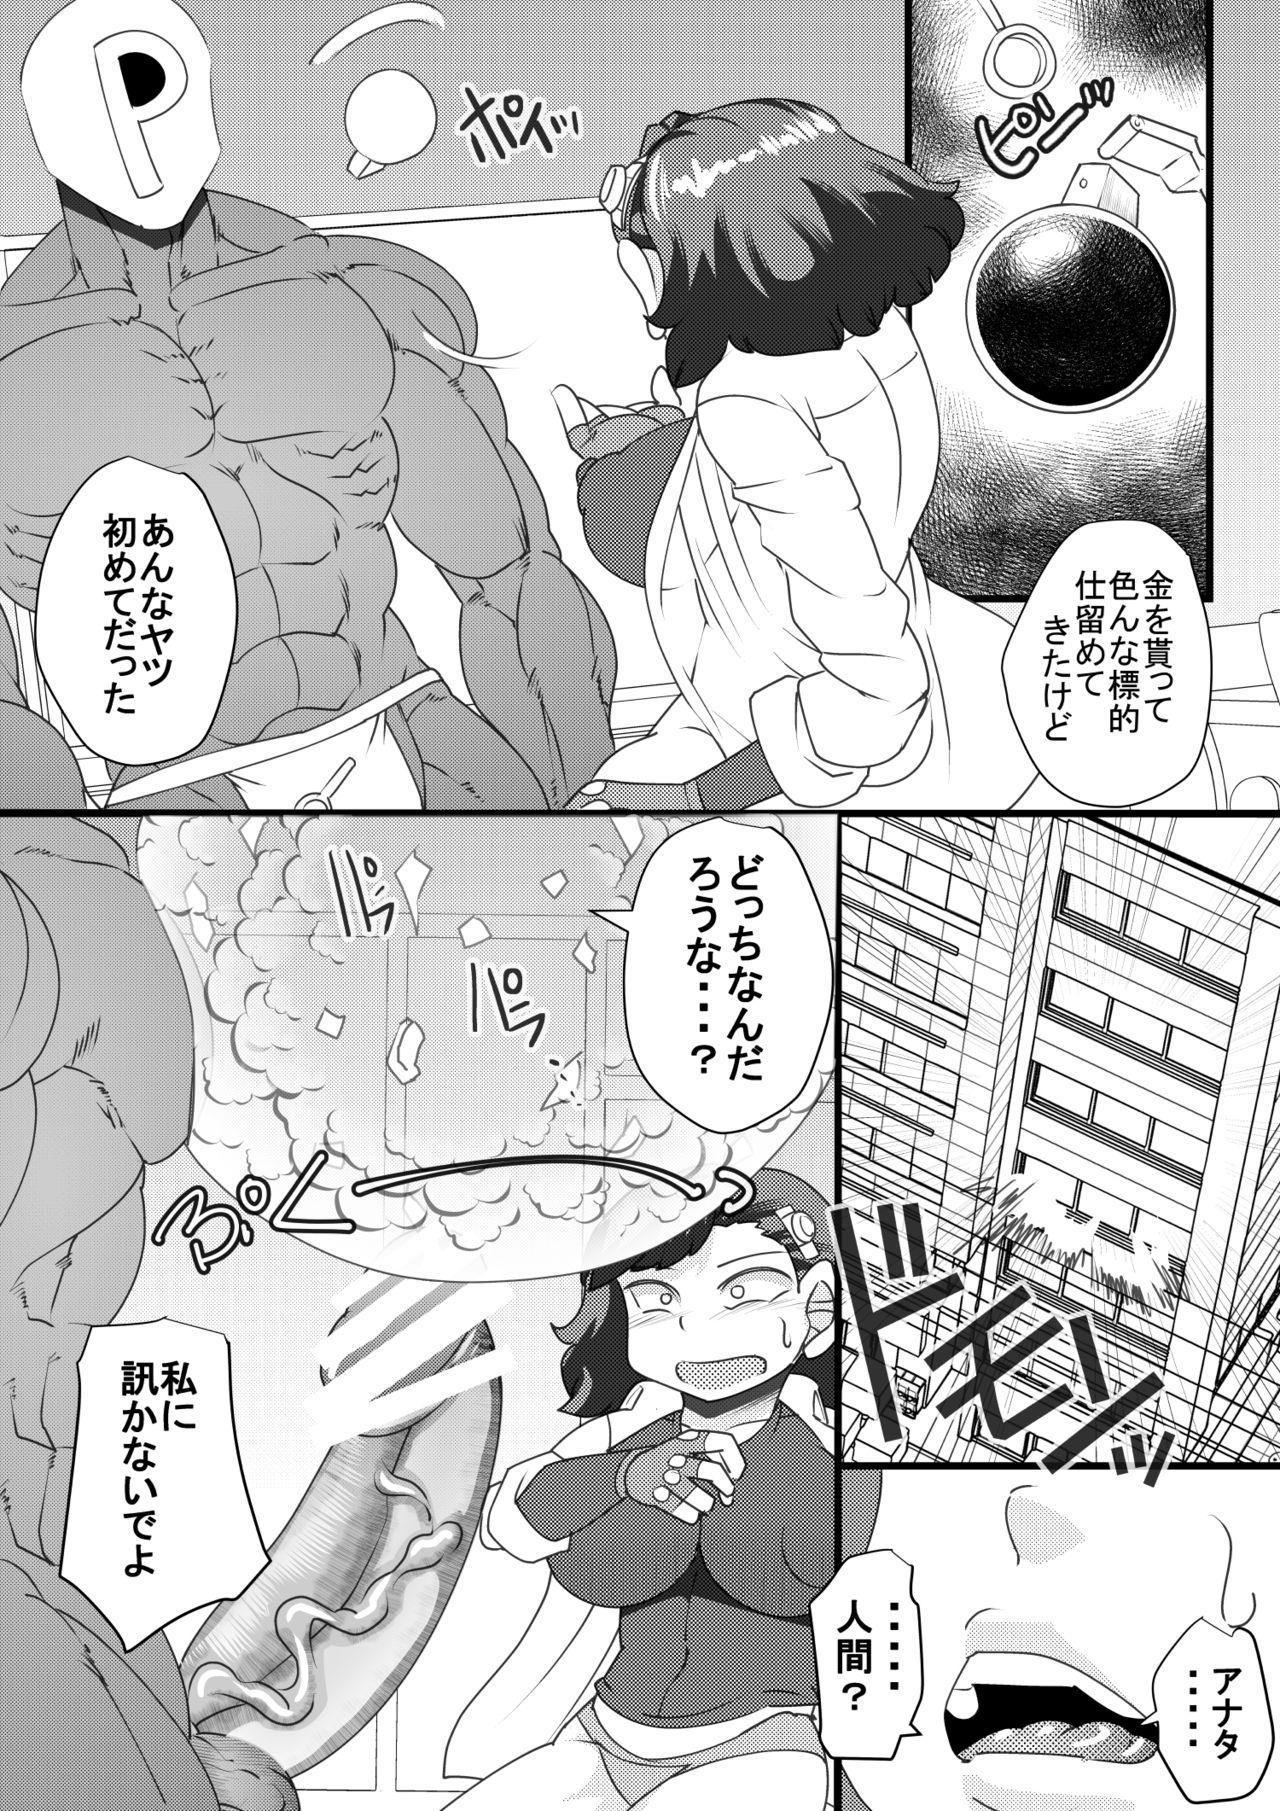 Haramachi 5 10